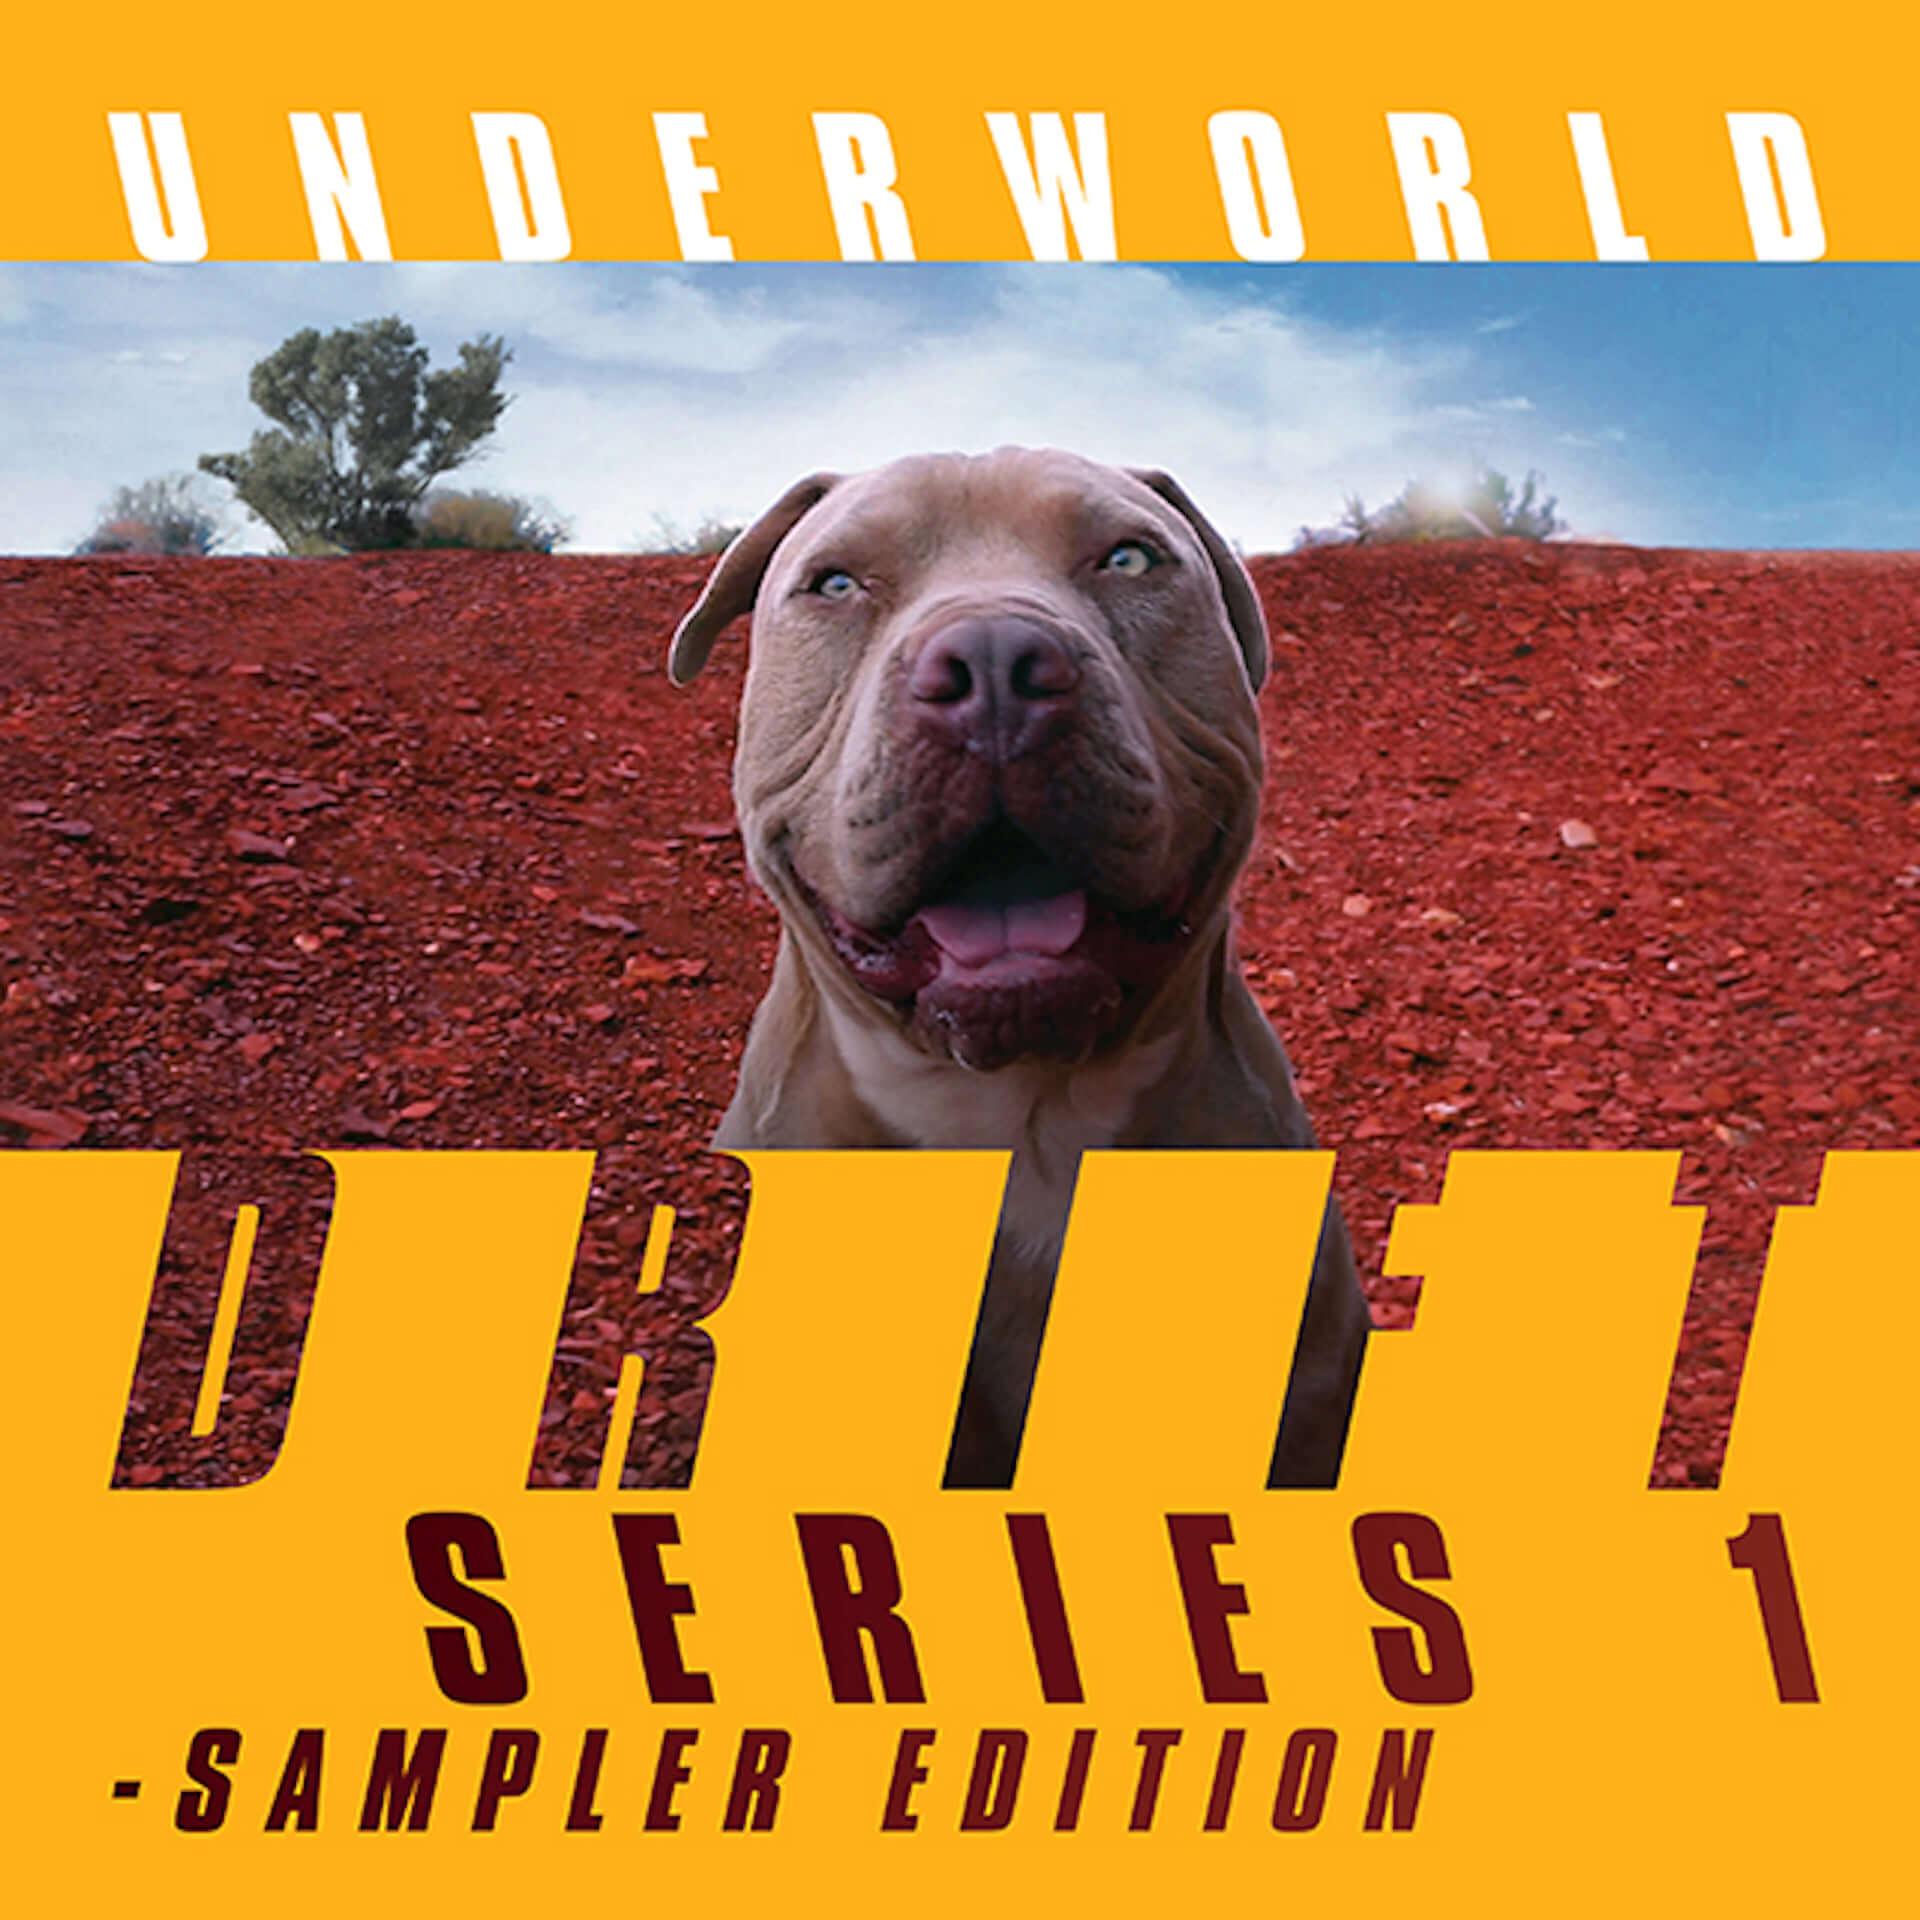 Underworldの伝説のステージ<SUMMER SONIC 2016>の記録映像が明日配信!当時のライブレポートが公開&公式Tシャツが復刻決定 music200626_underworld_1-1920x1920